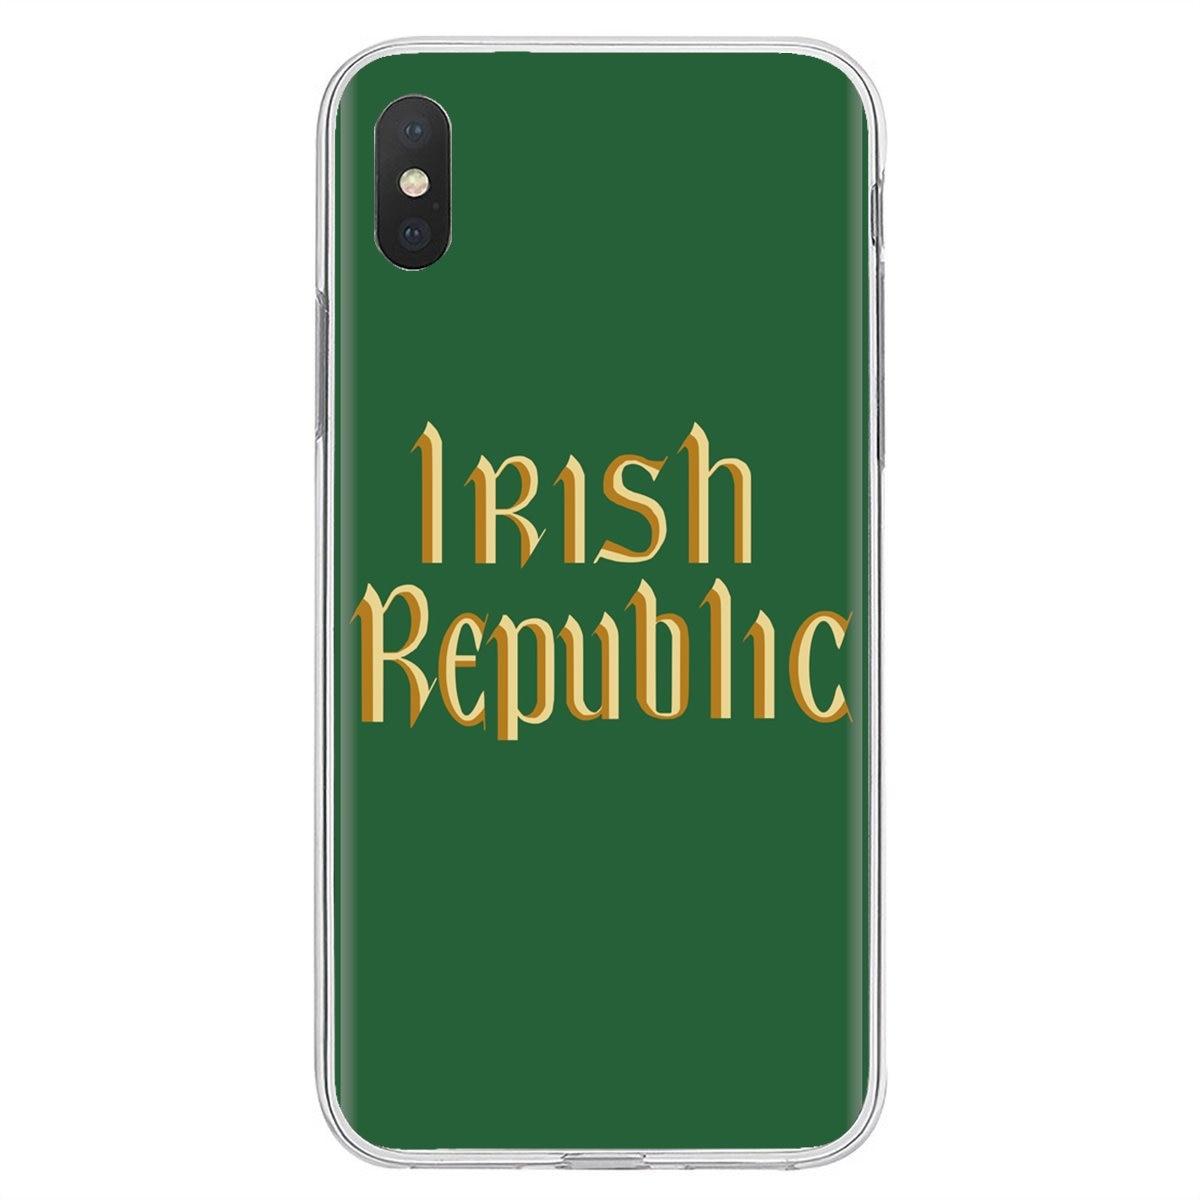 Personalized Silicone Phone Case Im Part Love Irish Music For Xiaomi Mi A1 A2 A3 5X 6X 8 9 9t Lite SE Pro Mi Max Mix 1 2 3 2S